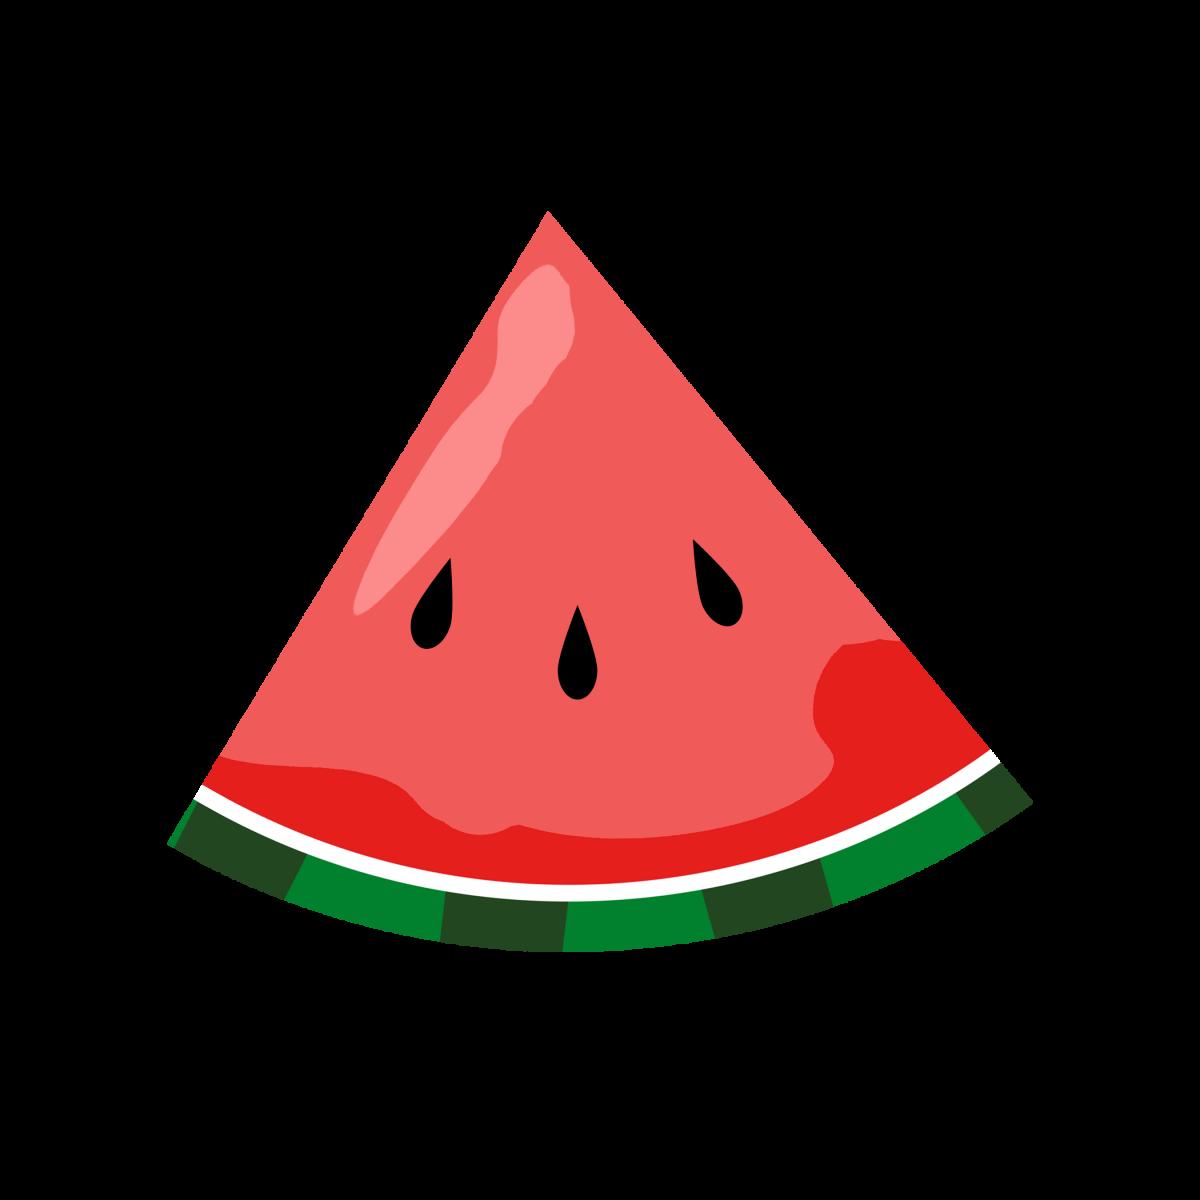 Watermelon clip art 2